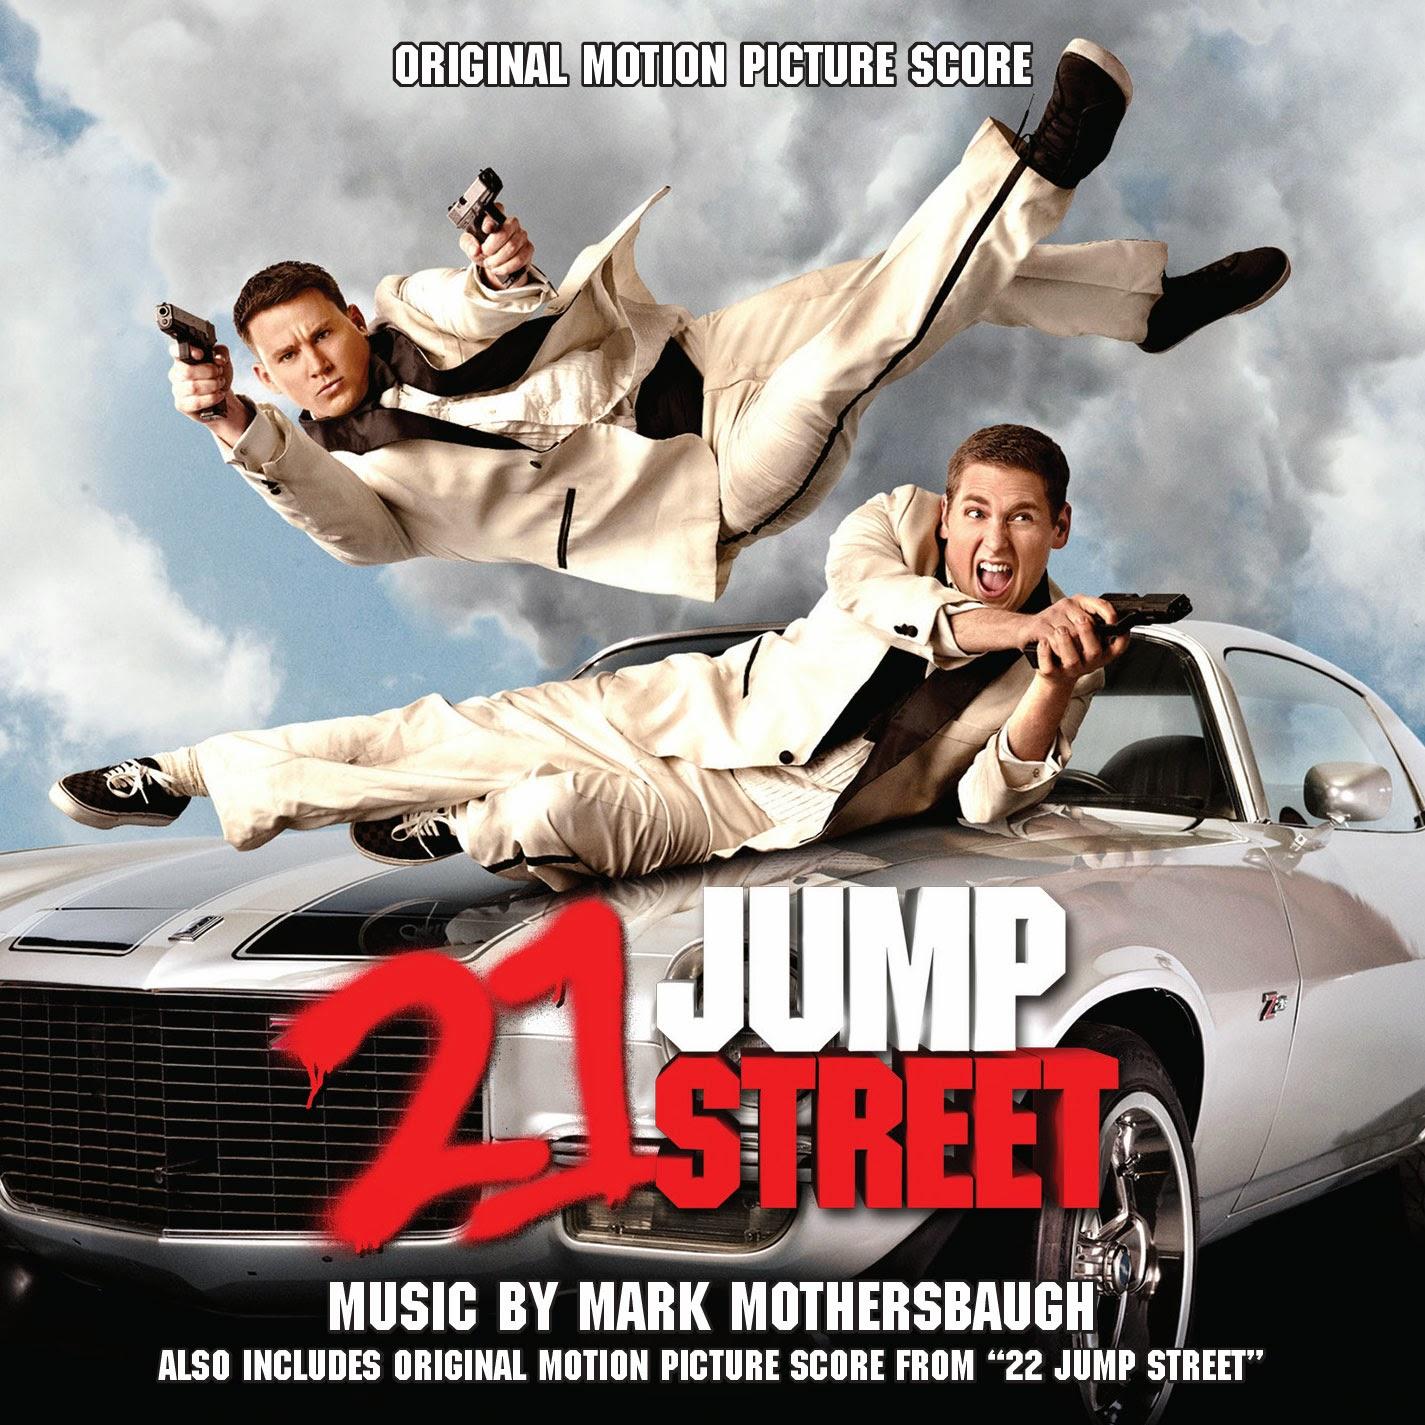 Freedom Movie 21 Jump Street 2012 Bluray